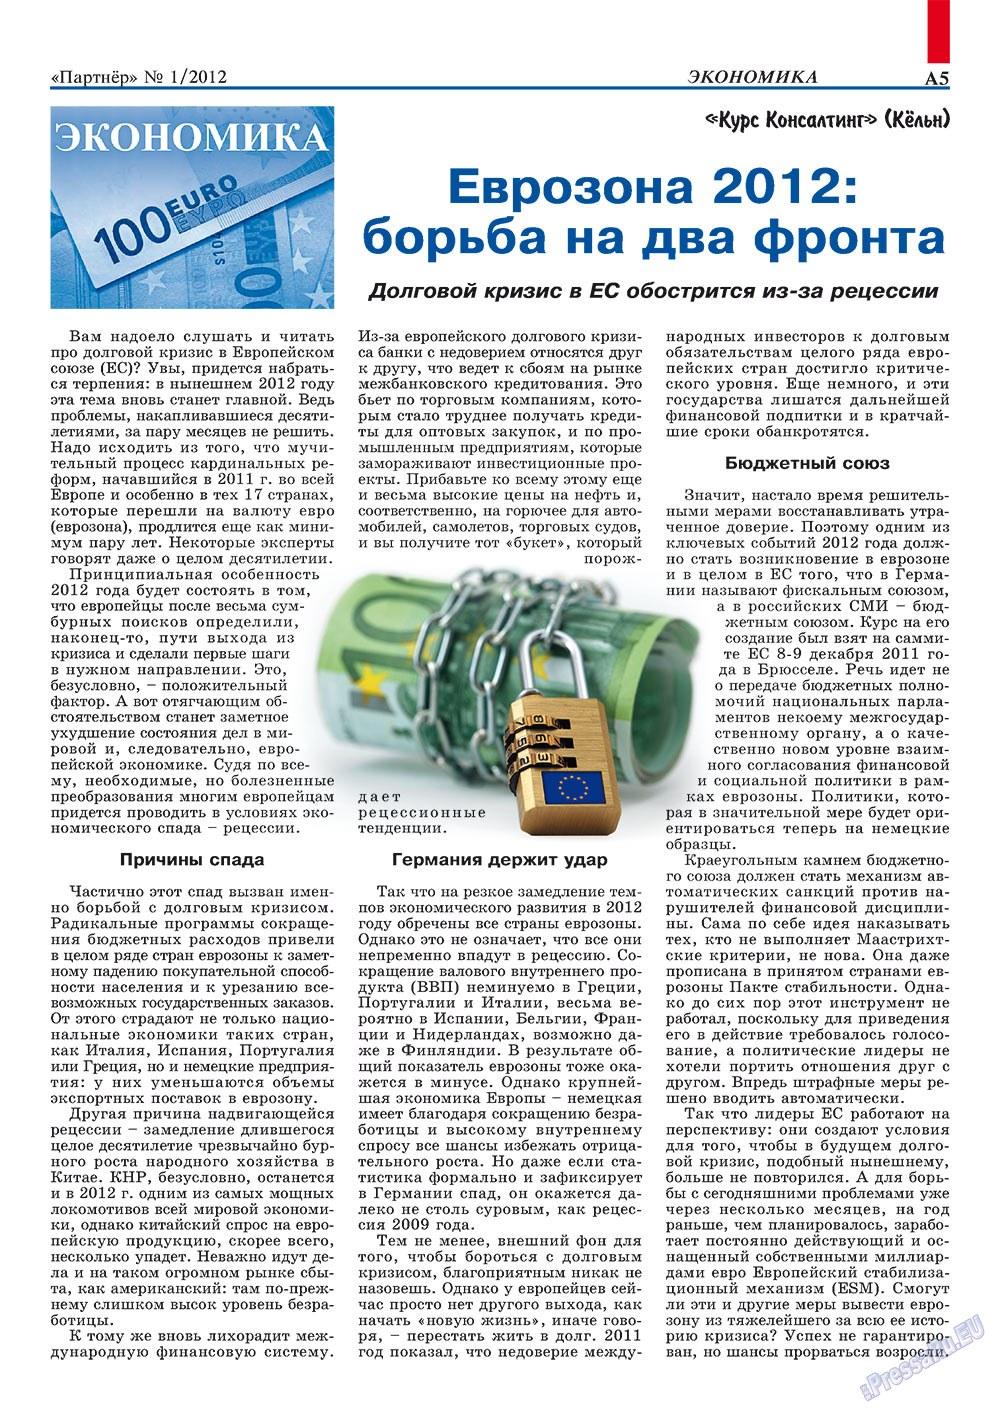 Партнер-север (журнал). 2012 год, номер 1, стр. 5